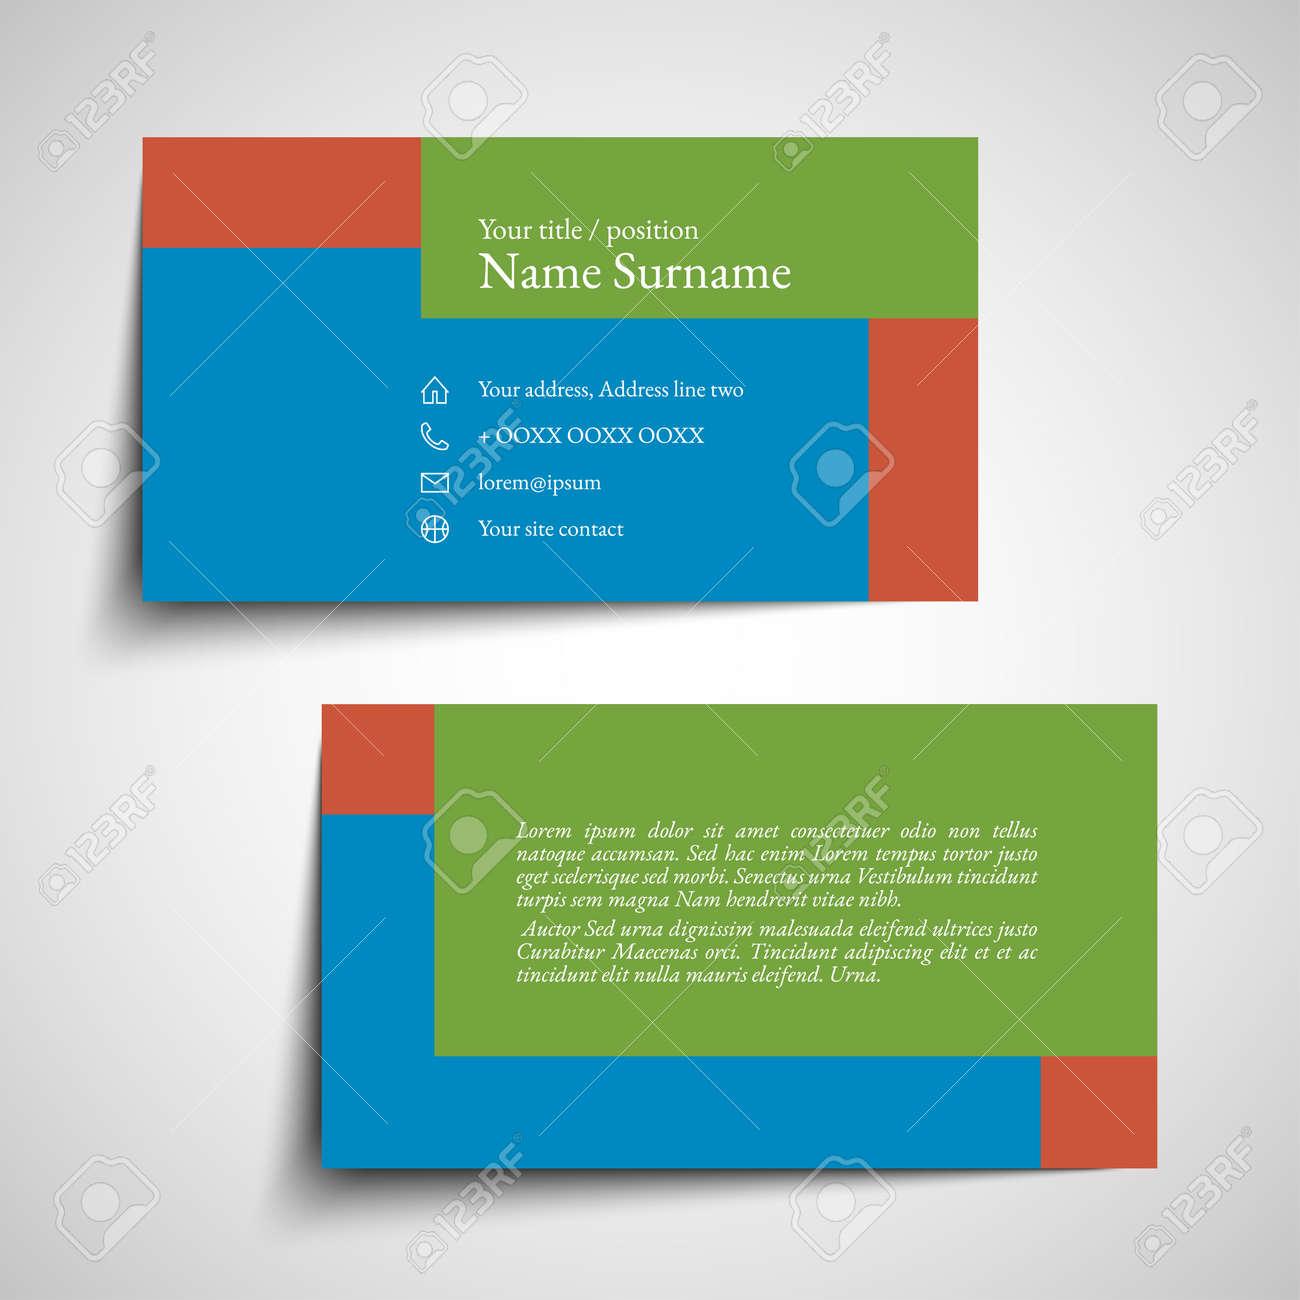 Set of simple modern business card design illustration royalty free set of simple modern business card design illustration stock vector 99118139 colourmoves